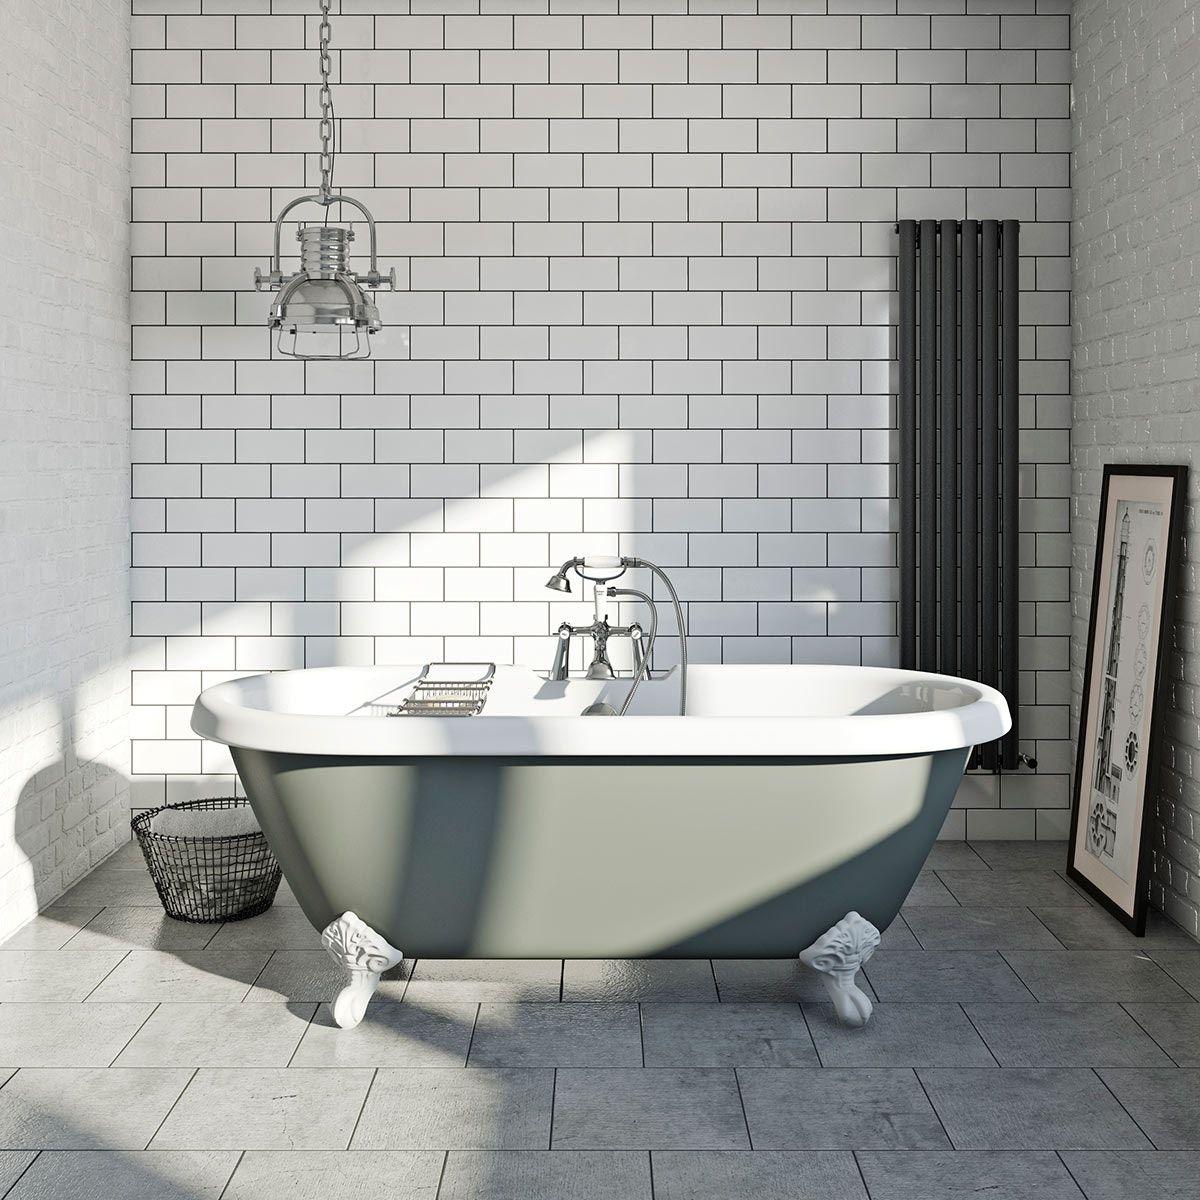 British Ceramic Tile Metro flat white gloss tile 100mm x 200mm ...